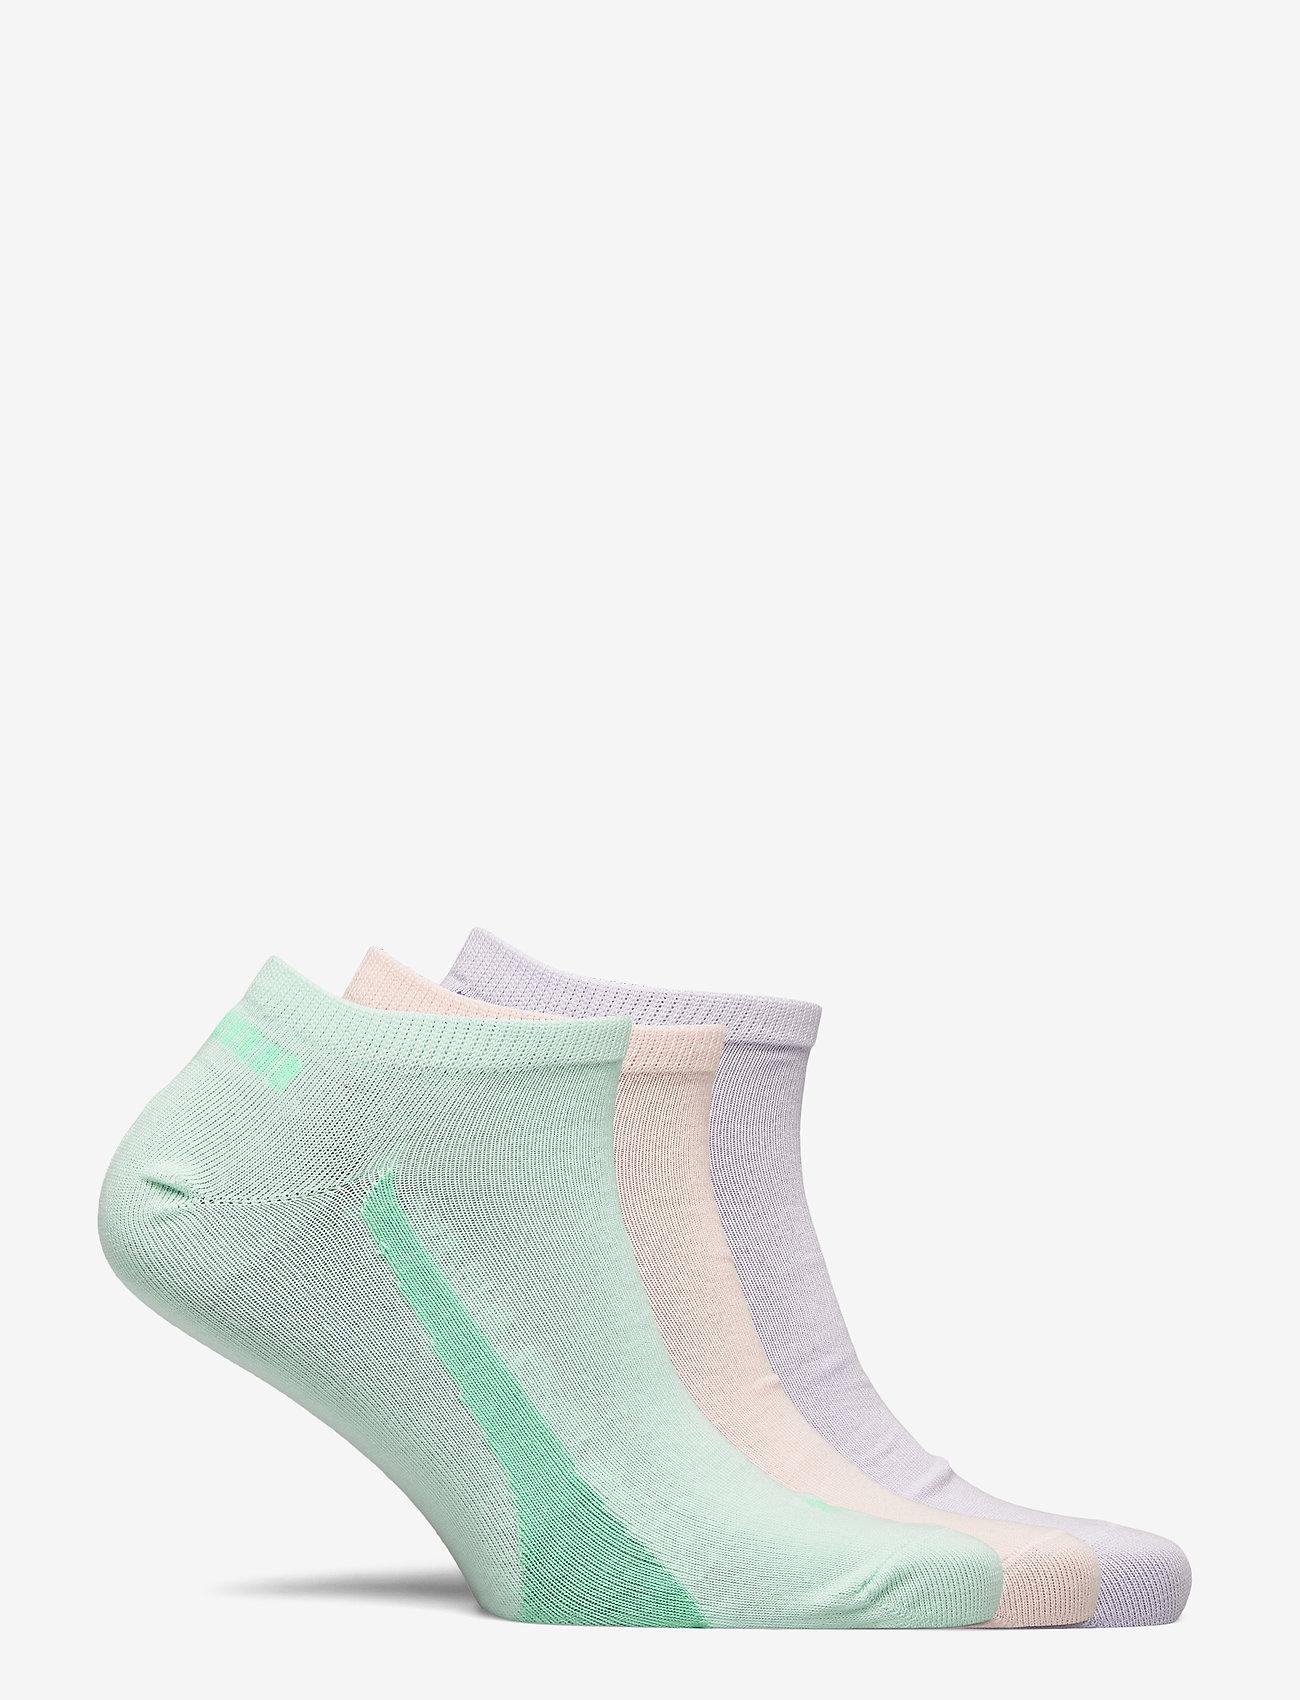 PUMA - PUMA UNISEX LIFESTYLE SNEAKERS 3P - kousen - mixed colors - 1